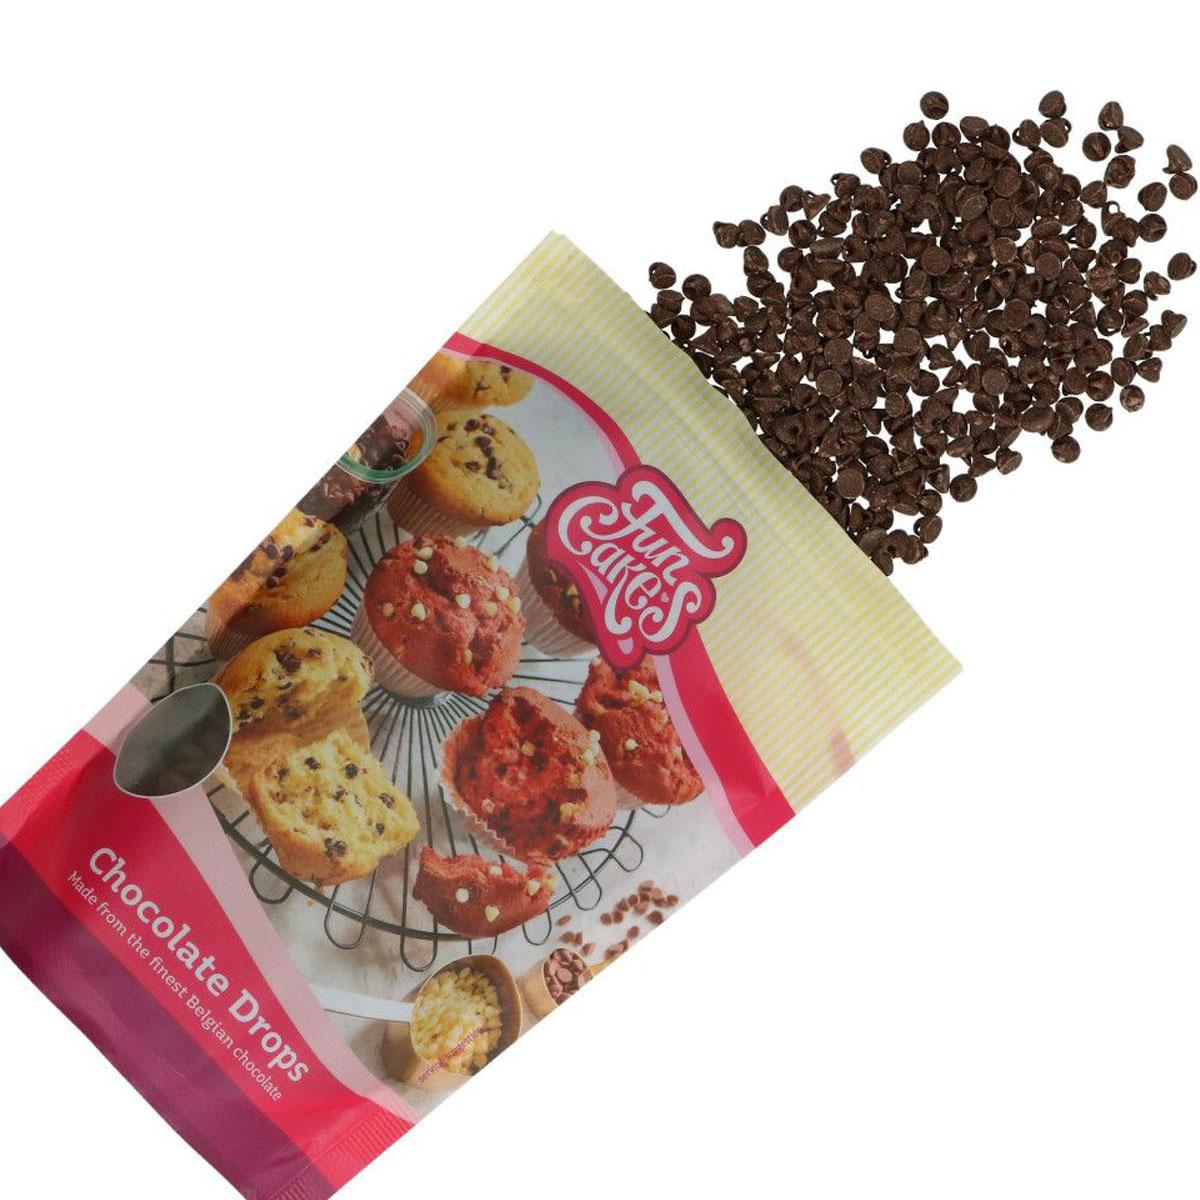 FunCakes Chocolate Drops Dunkle Schokolade 350g